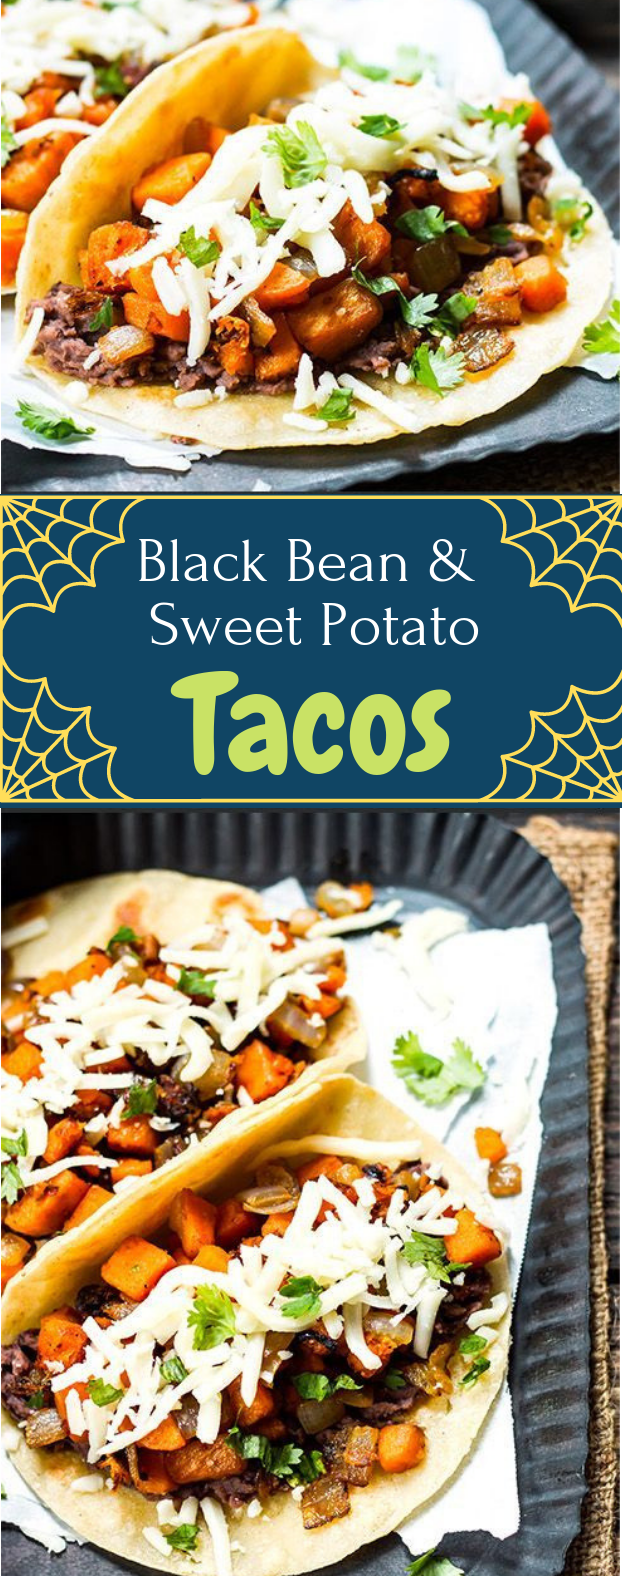 BLACK BEAN & SWEET POTATO TACOS #dinner #healthyrecipe